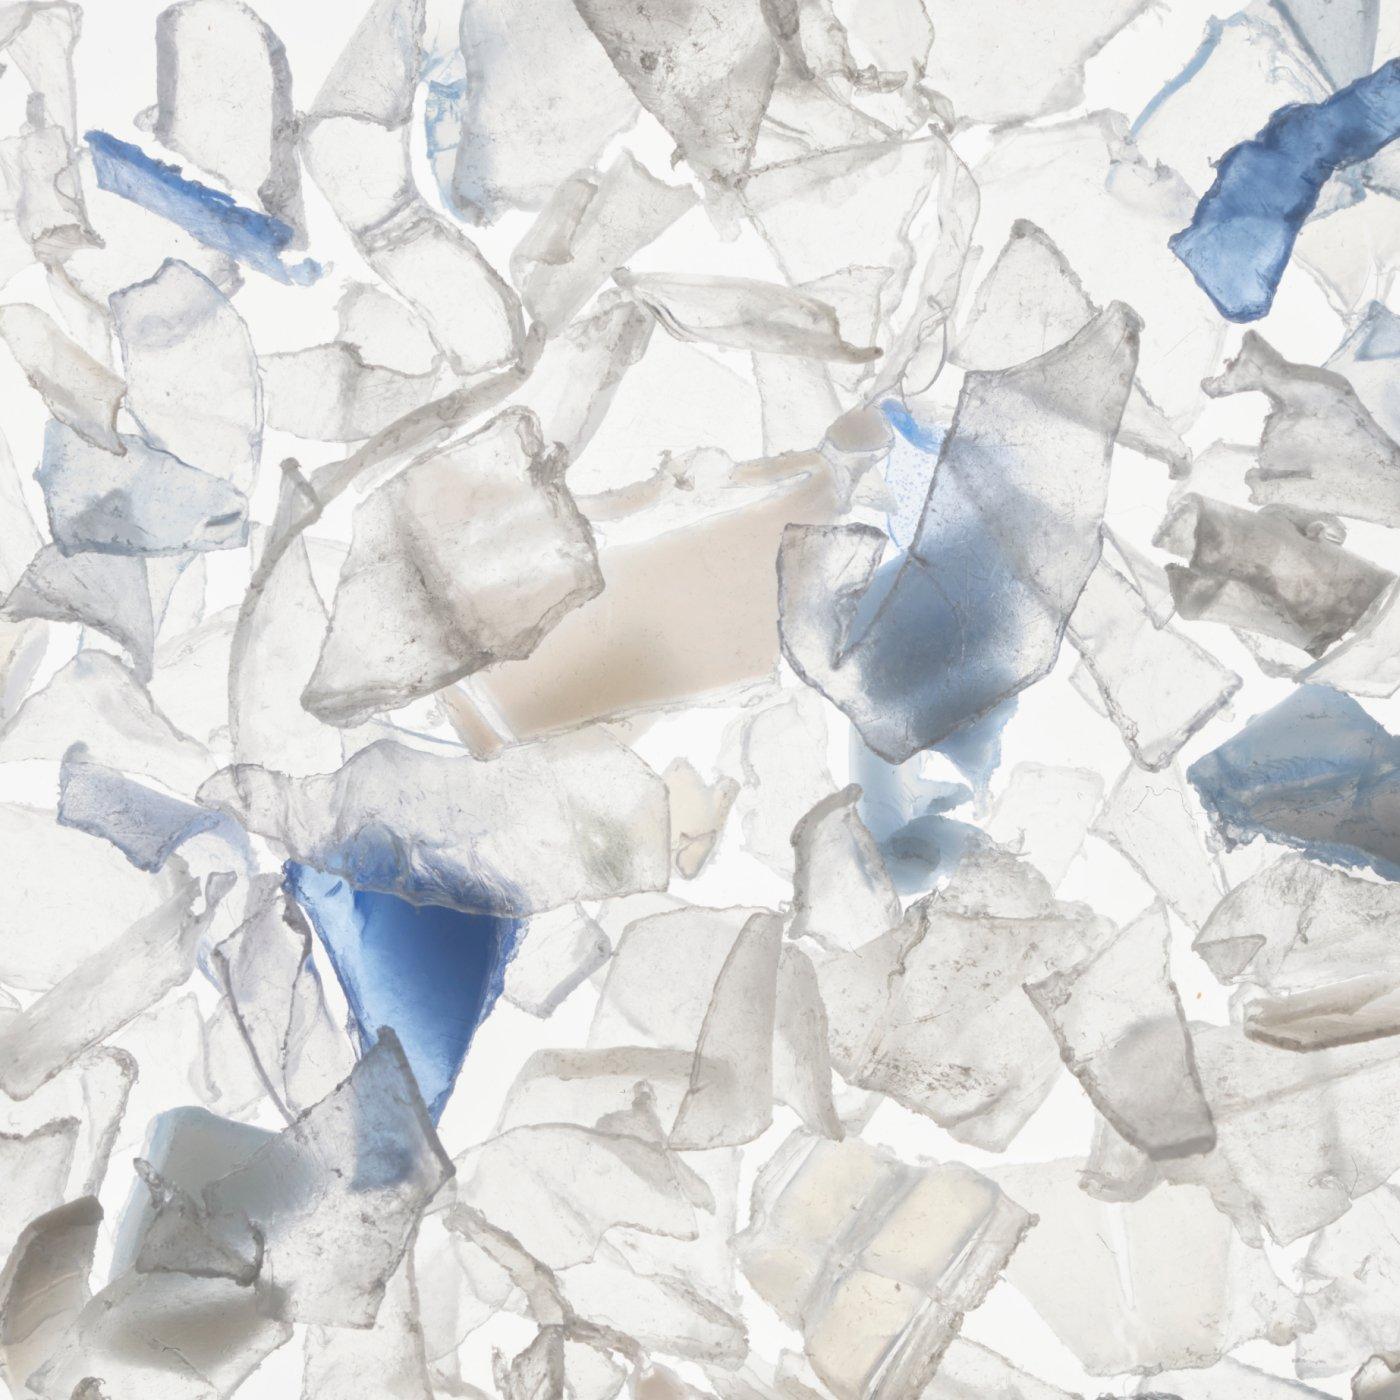 Broken pieces of plastic bottles for Rothy's plastic thread